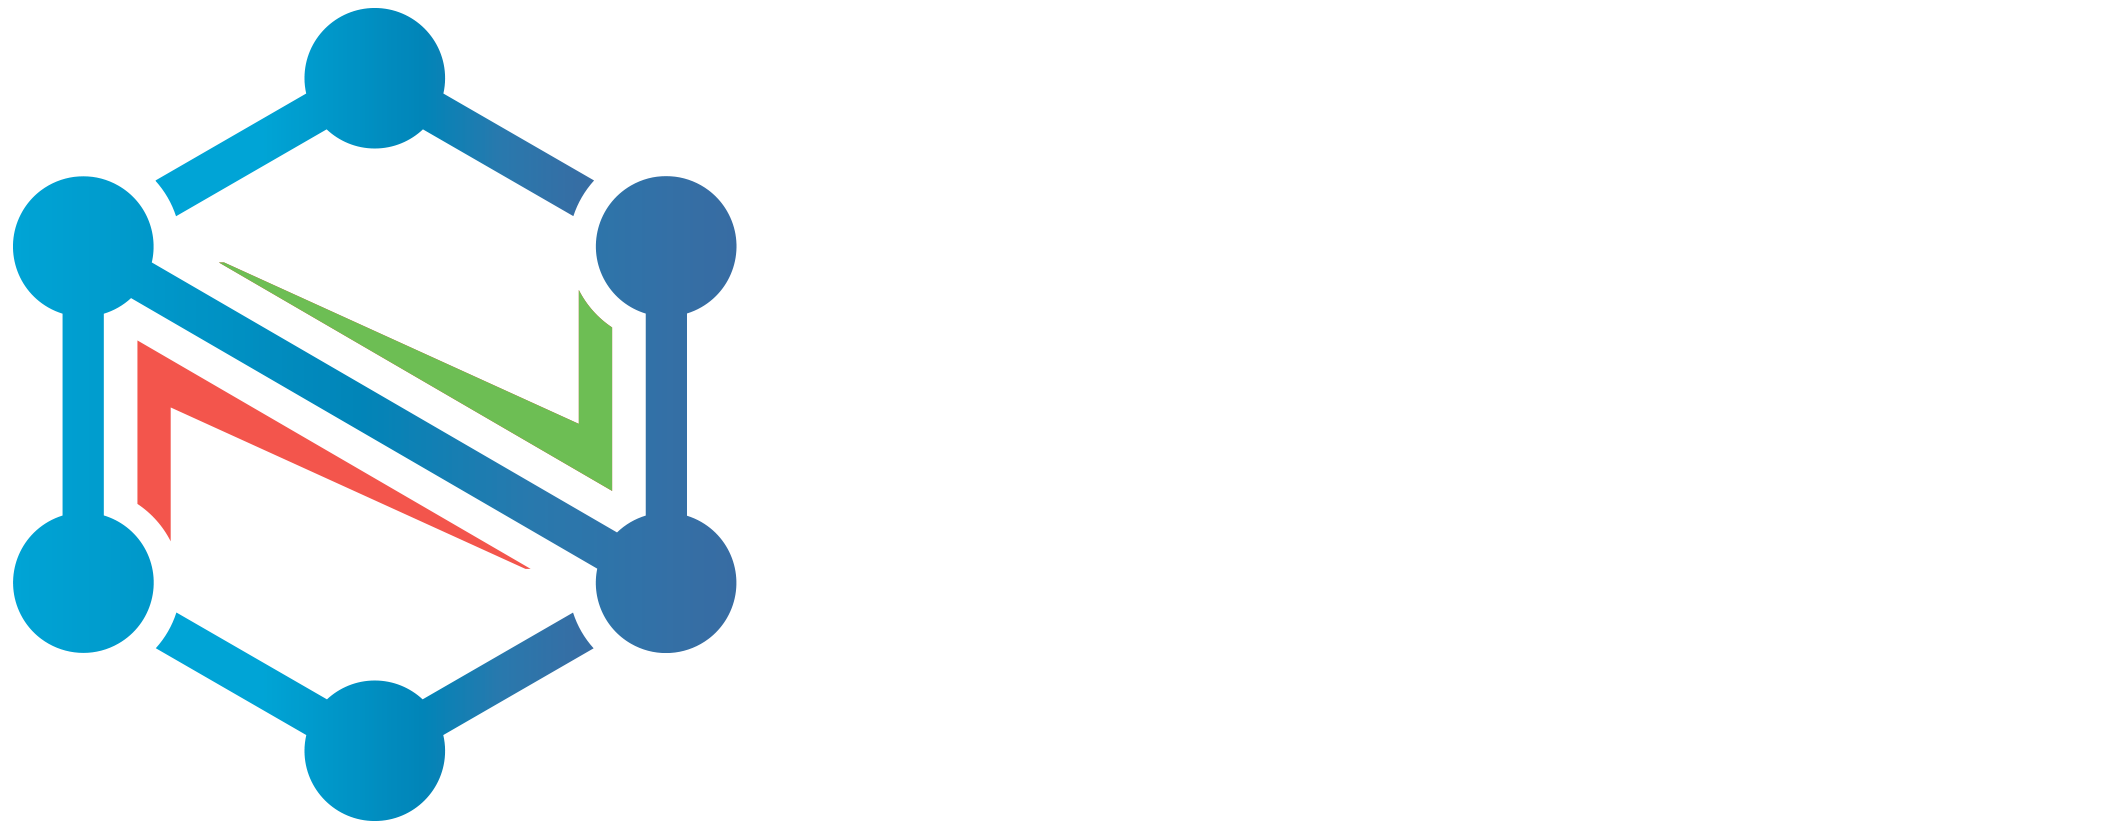 nucex logo